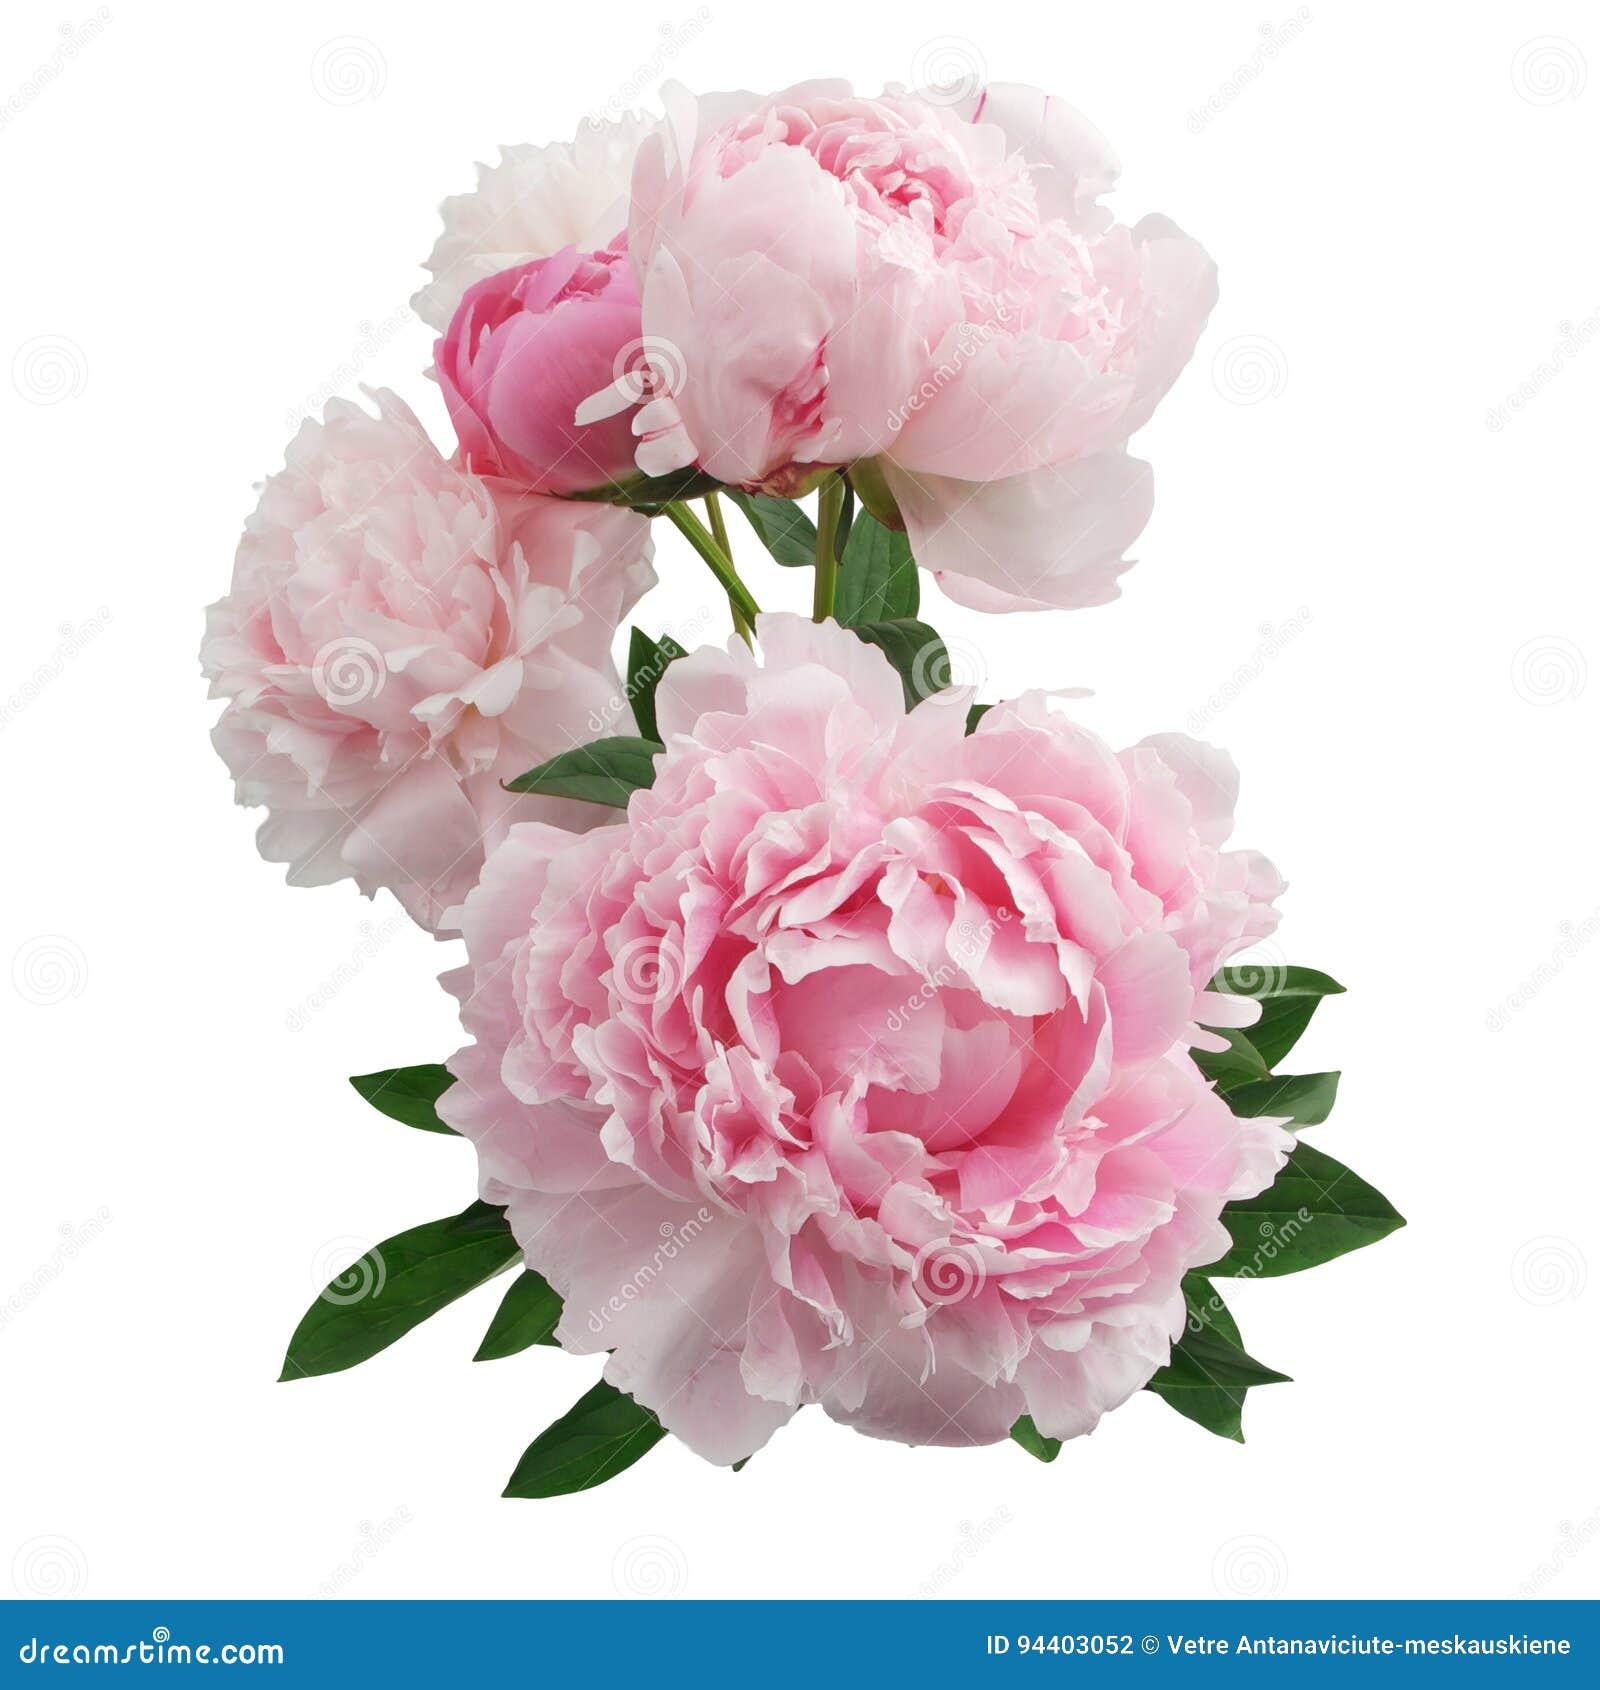 fleur rose fond blanc id e d 39 image de fleur. Black Bedroom Furniture Sets. Home Design Ideas